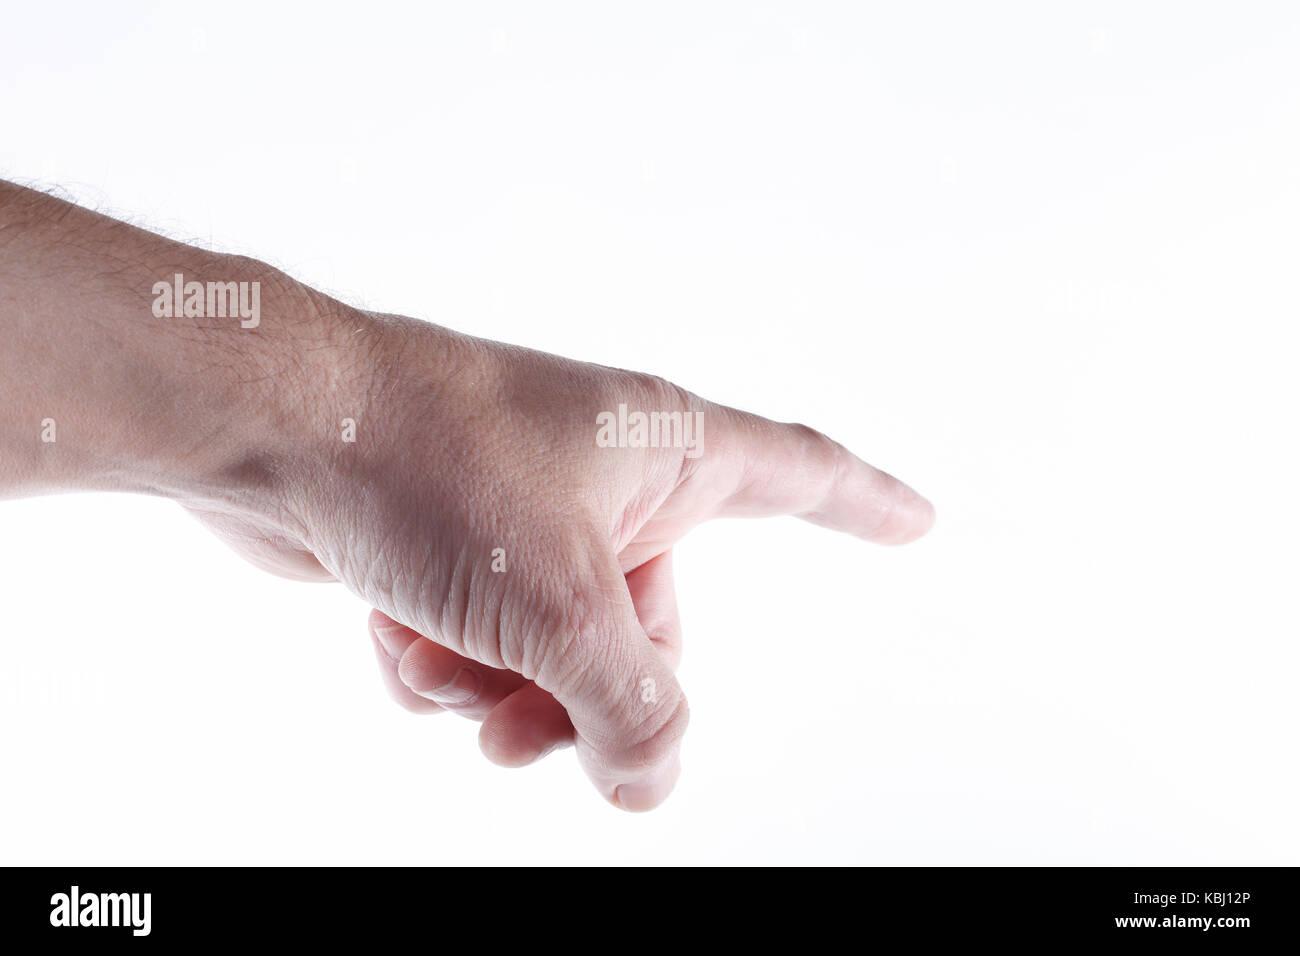 Man pointing on white background. - Stock Image